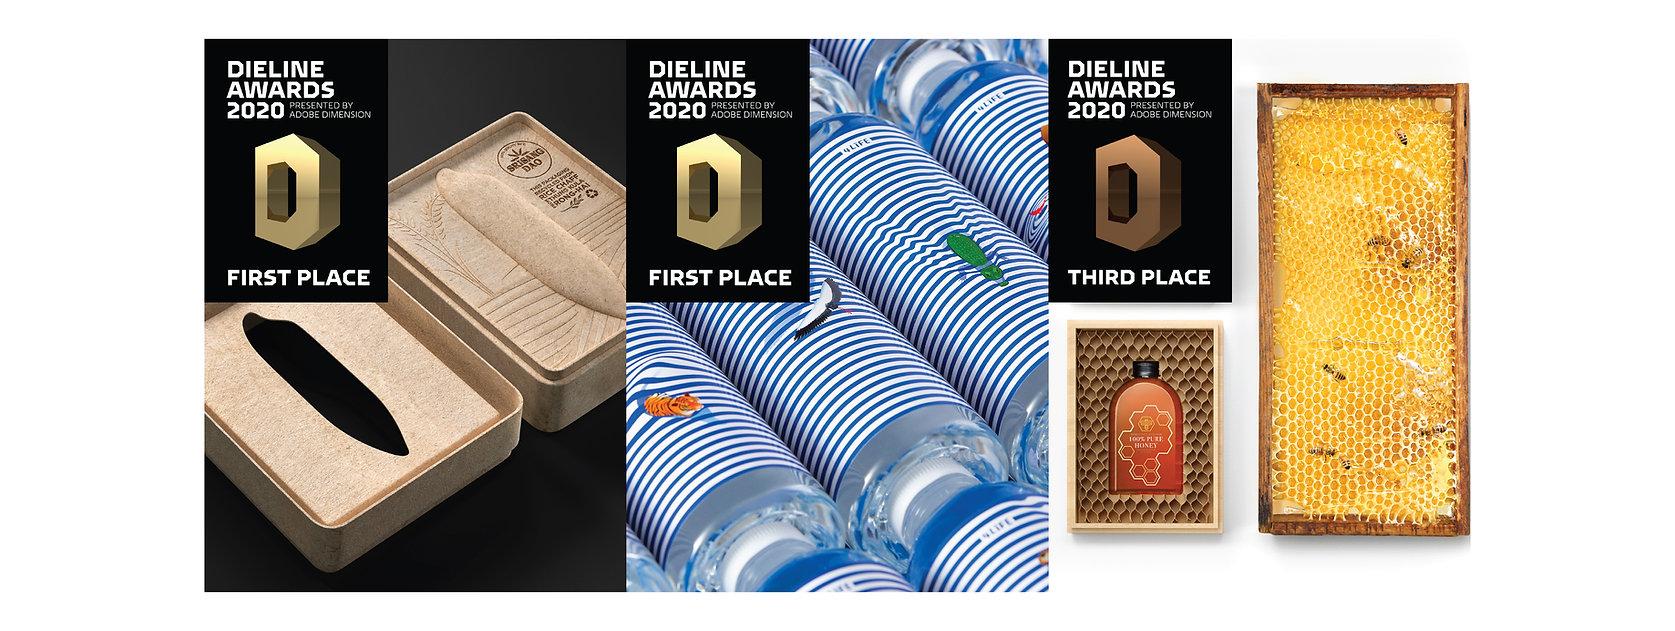 Prompt-Design-Dieline-Award-Packaging-De